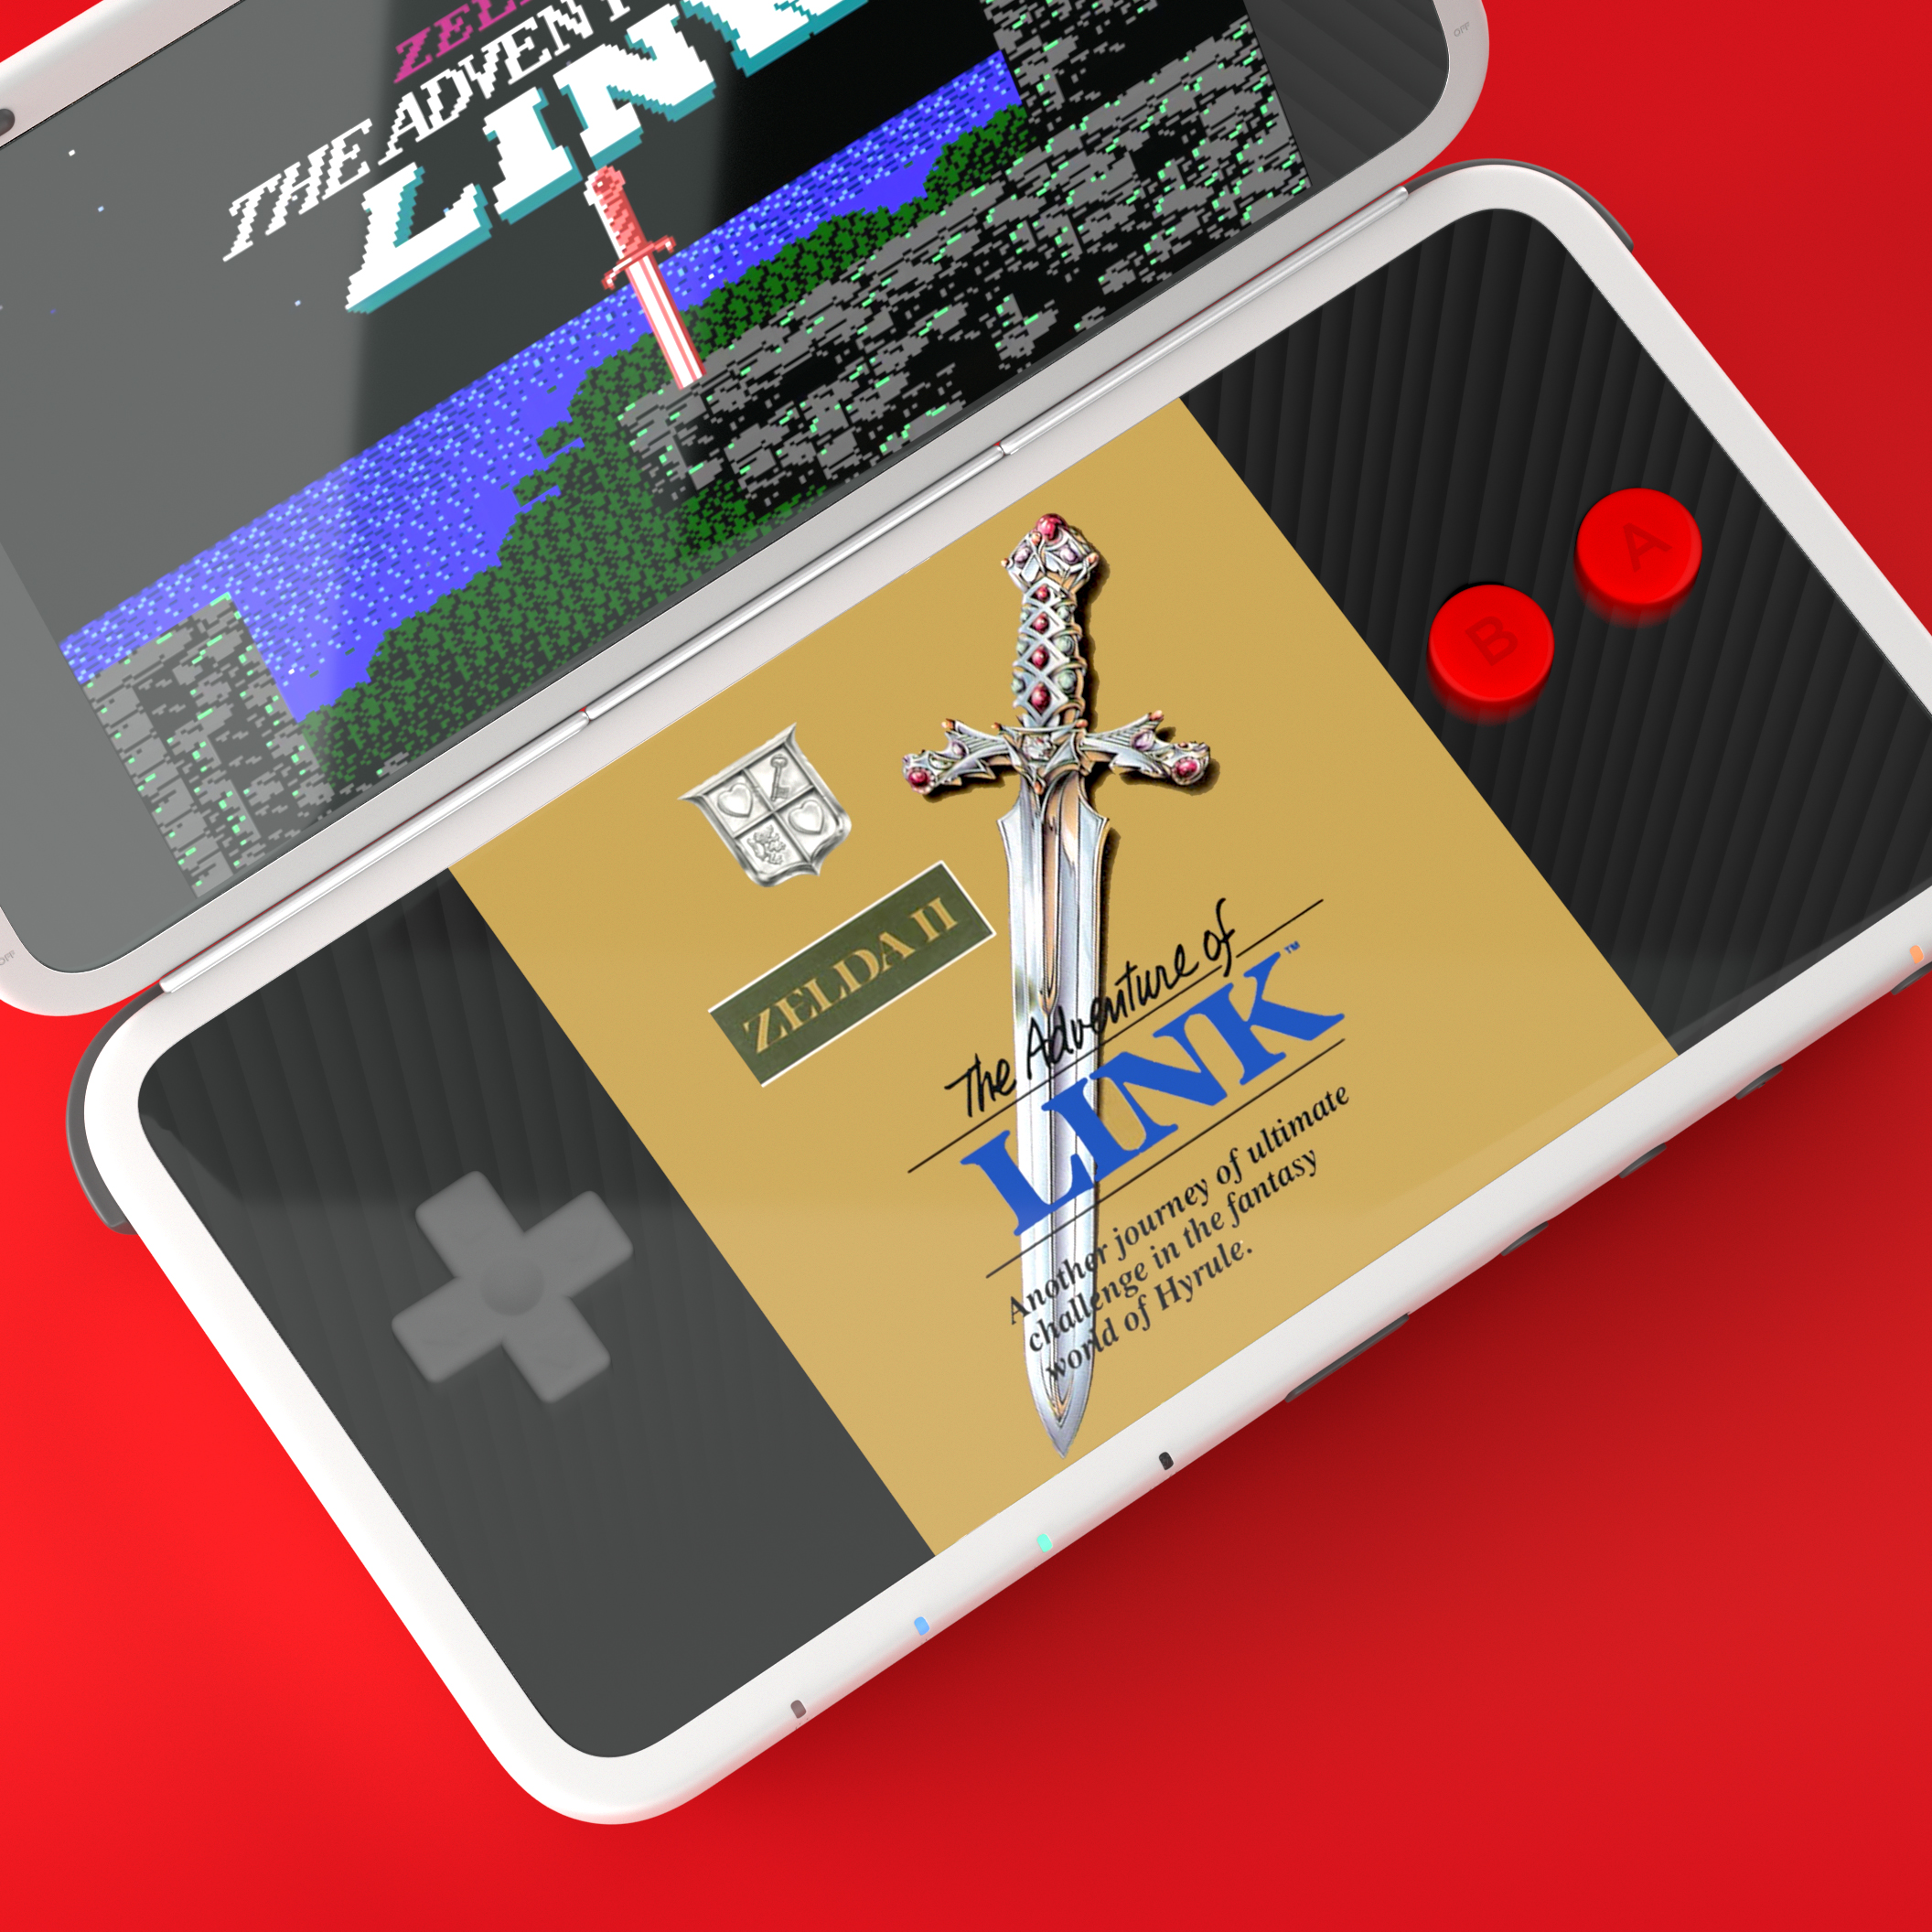 07_NES.jpg